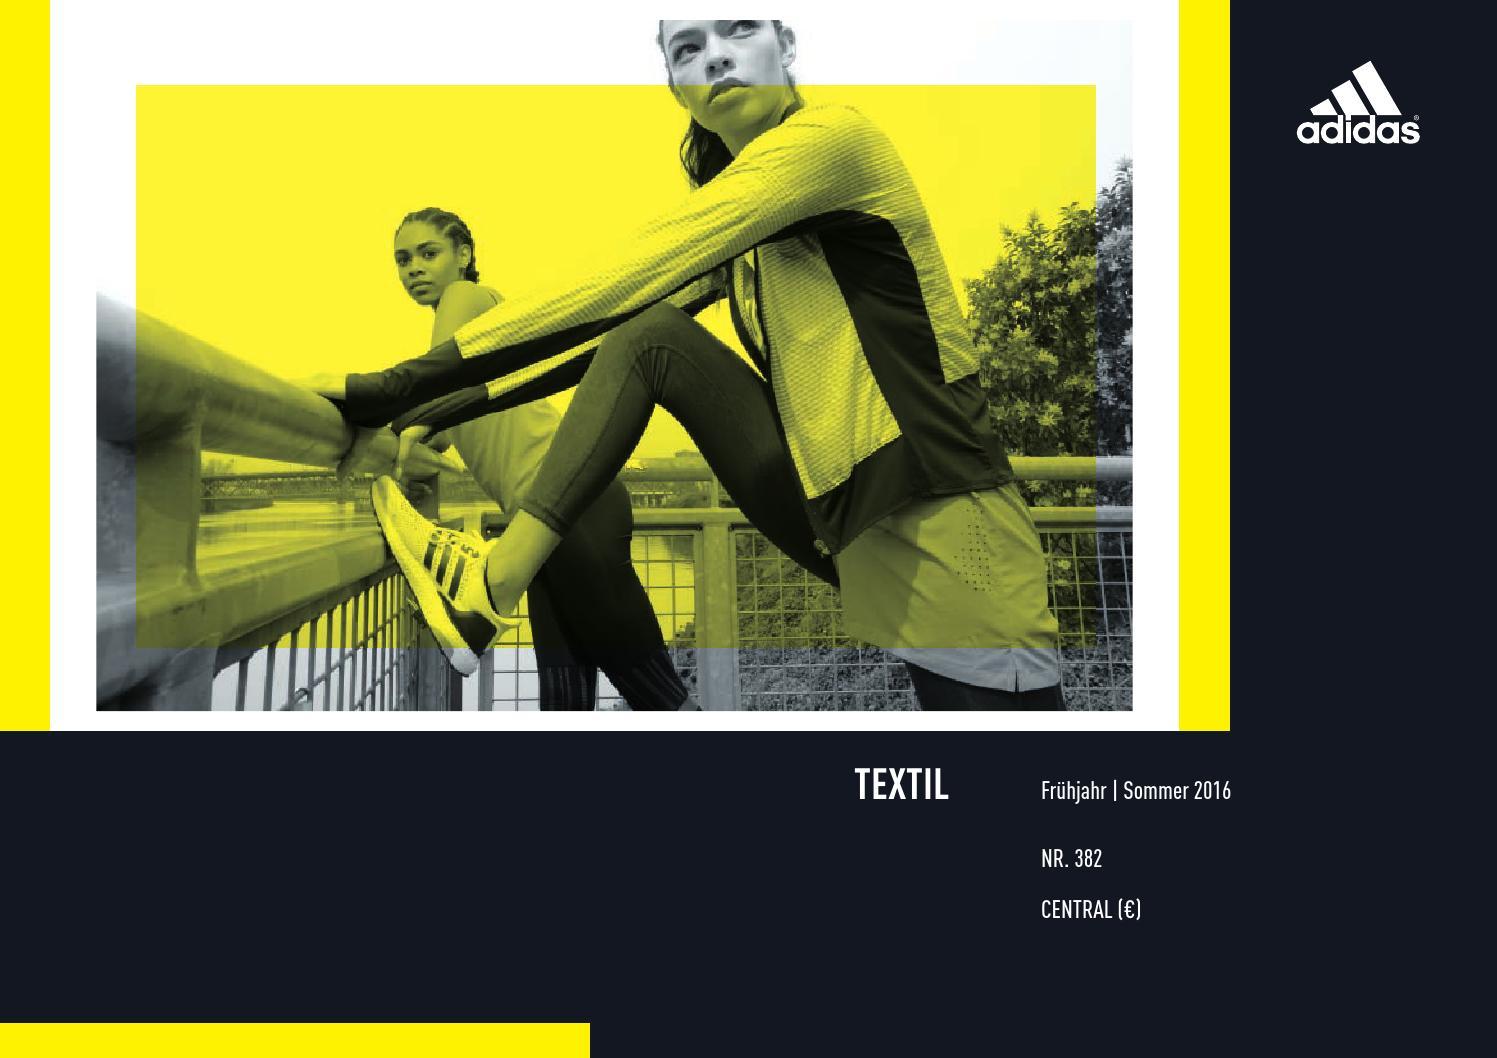 39a686b3eacb 16q1 382 textil eur by Euroteamsport Vilshofen - issuu